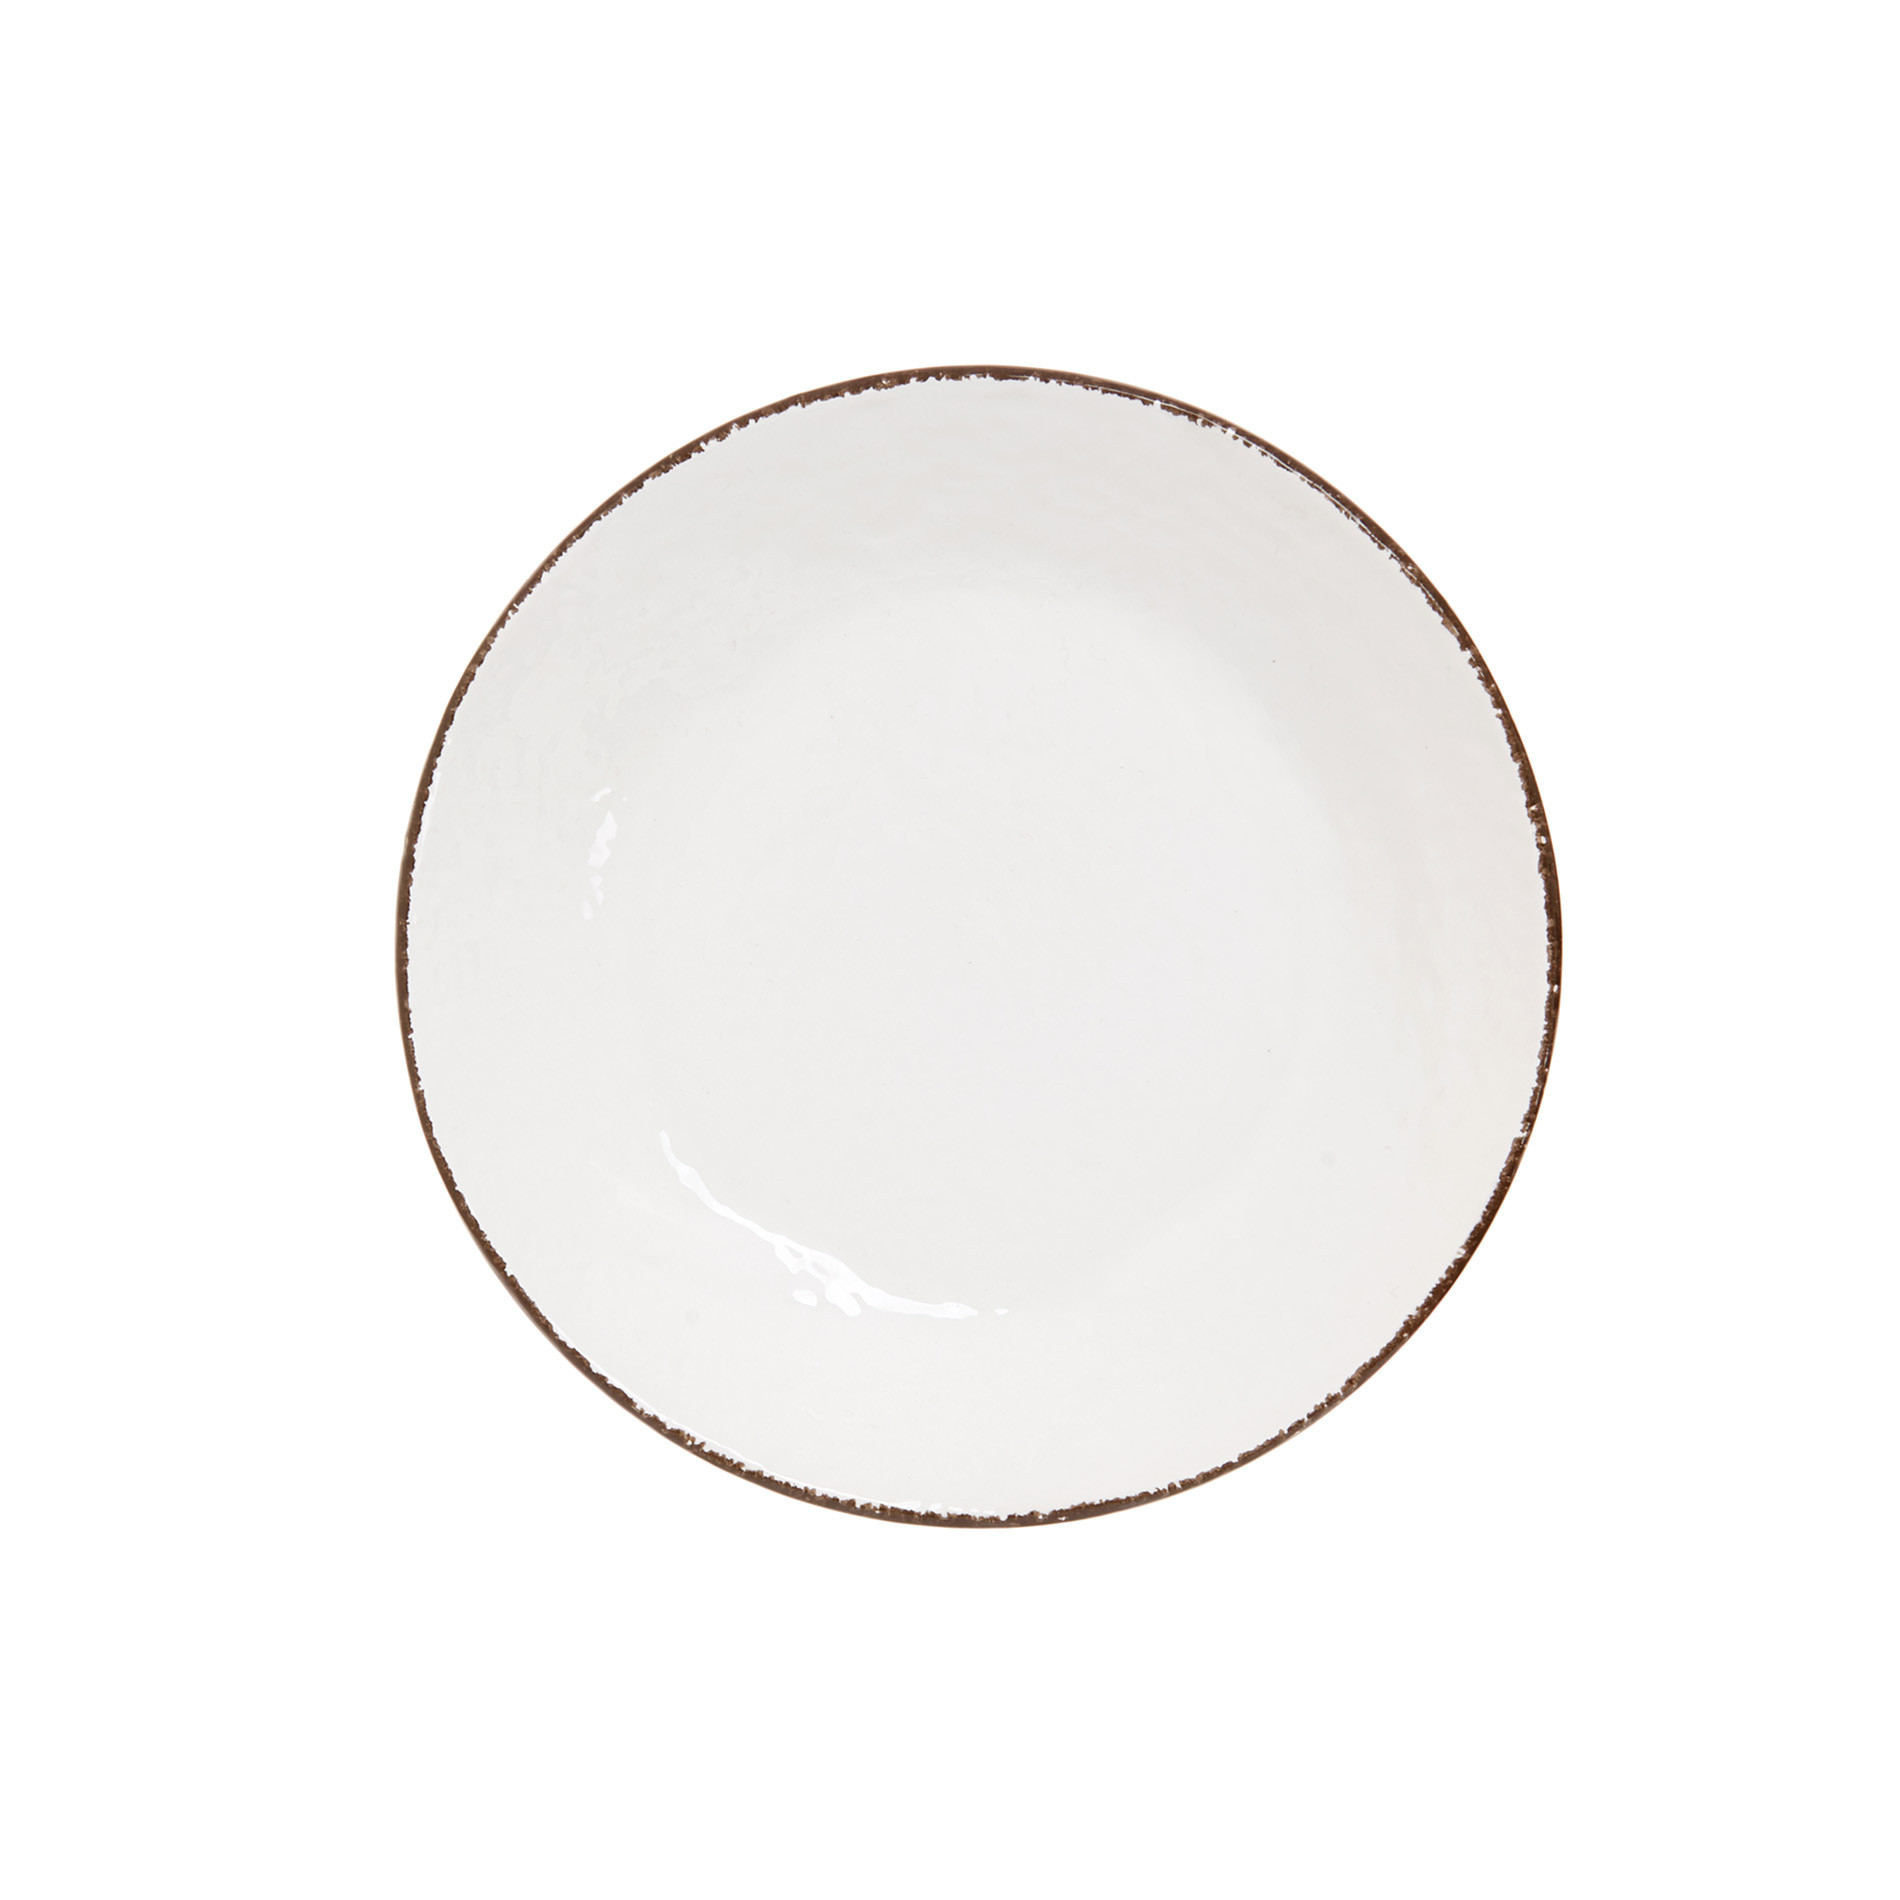 Piatto fondo ceramica artigianale Preta, Bianco, large image number 1